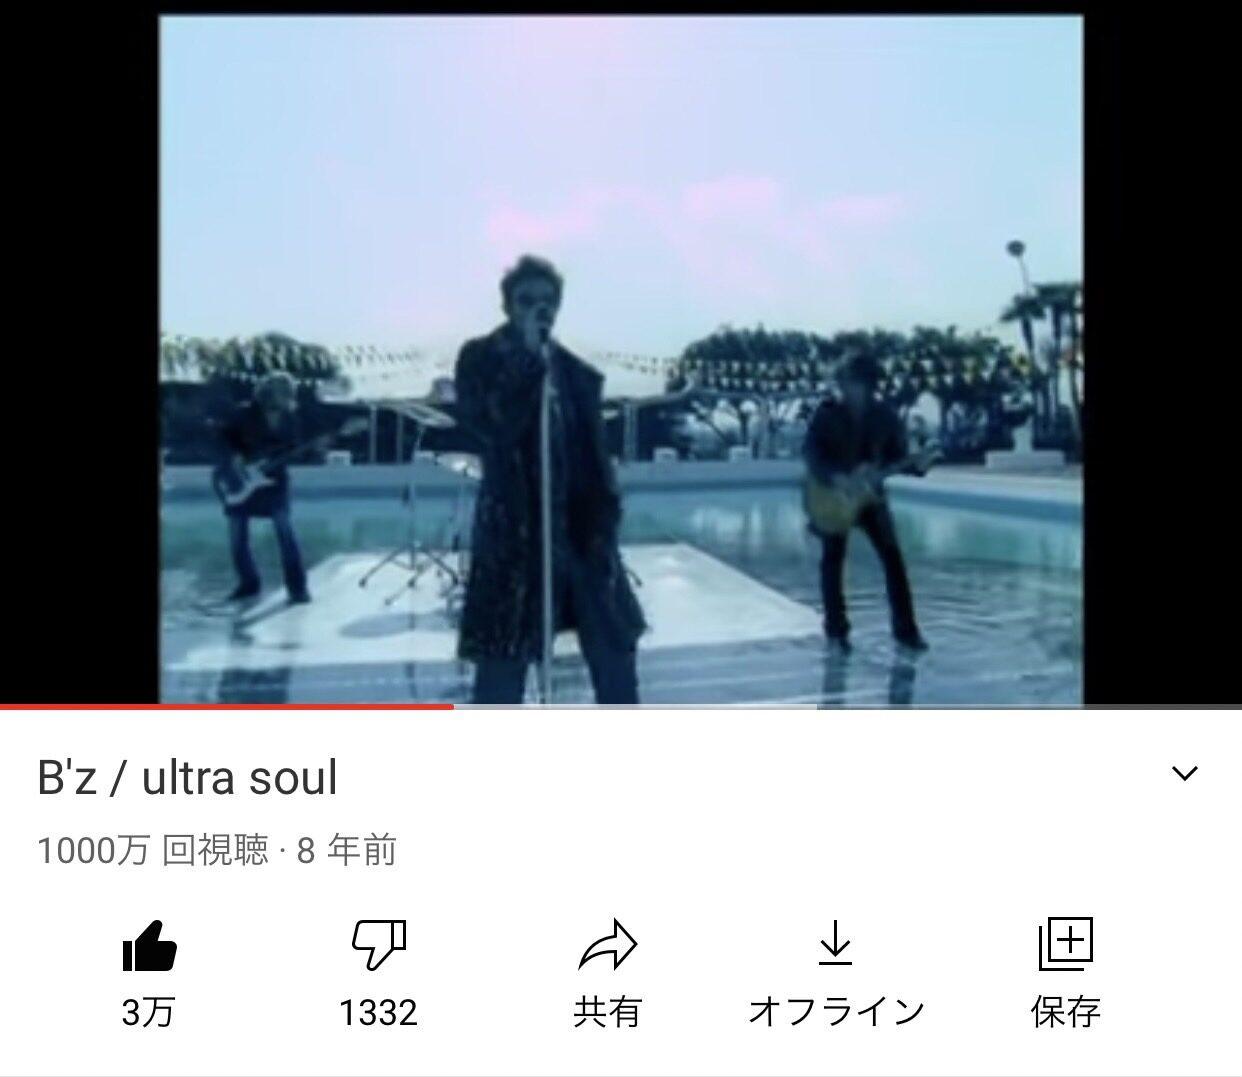 B'z公式YouTubeチャンネルで1000万回再生を達成した「ultra soul」ミュージックビデオの画像